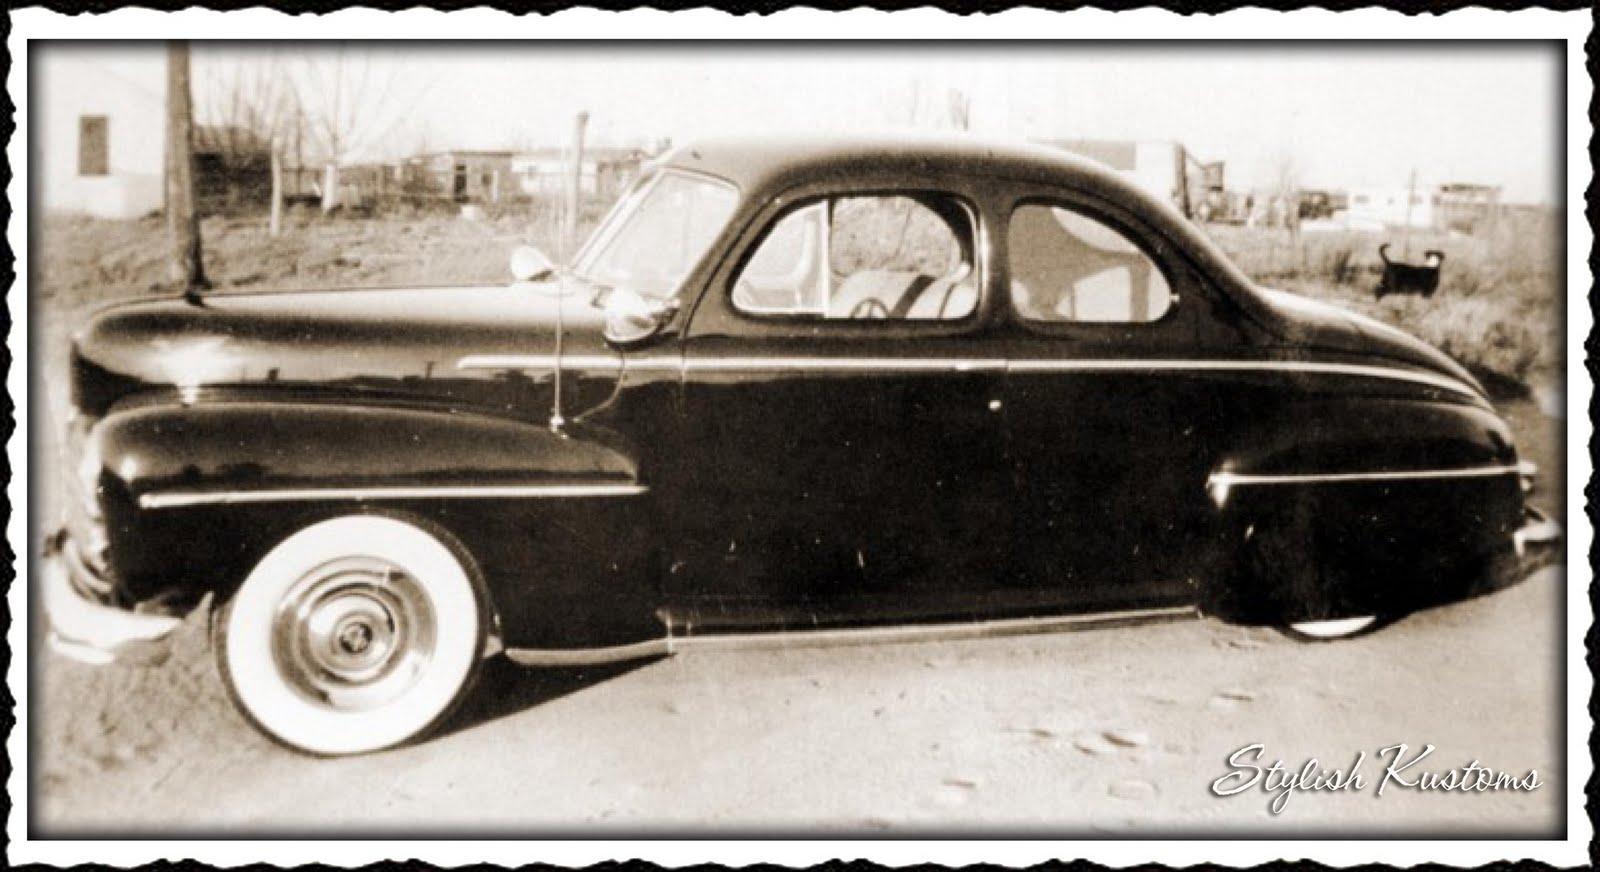 40s Ford Kustom copy.jpg